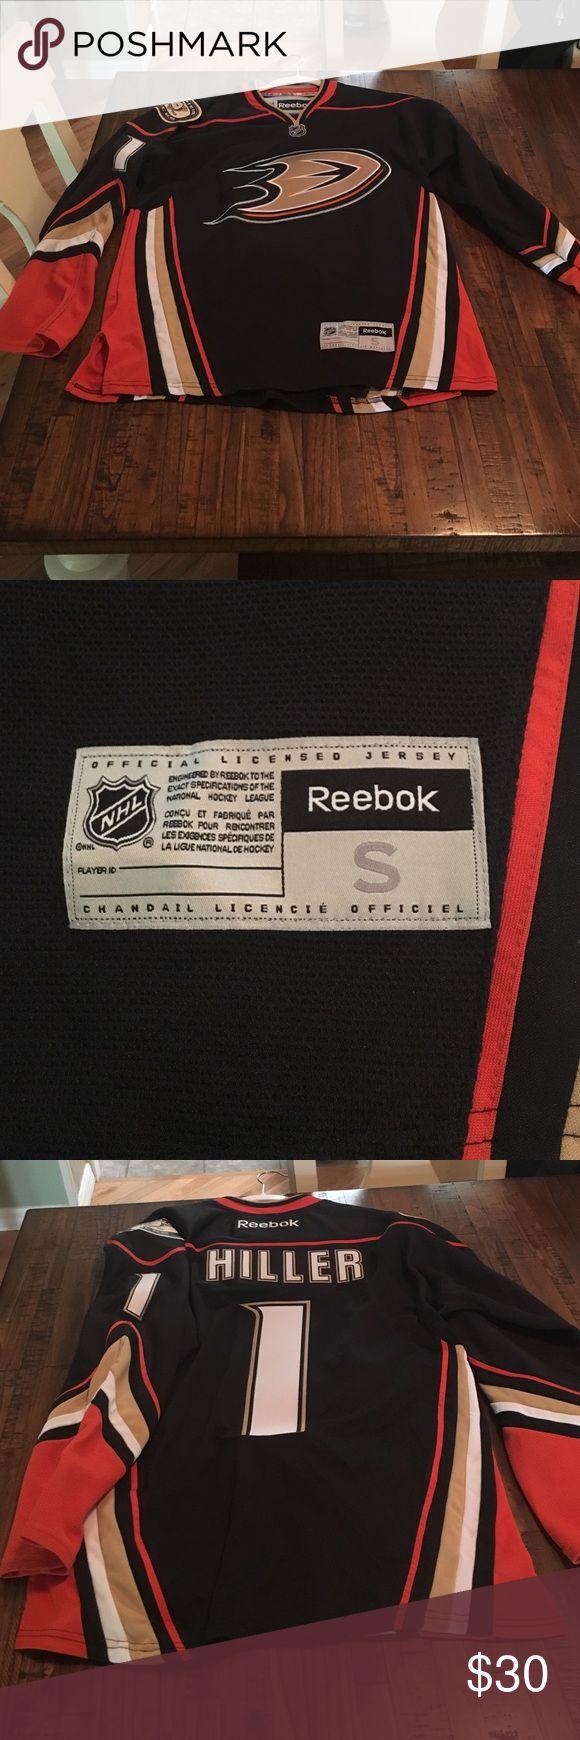 Jonas Hiller Anaheim Ducks Jersey Ducks Home Jersey. Worn less than five times. Like new condition. Size S. Reebok Other